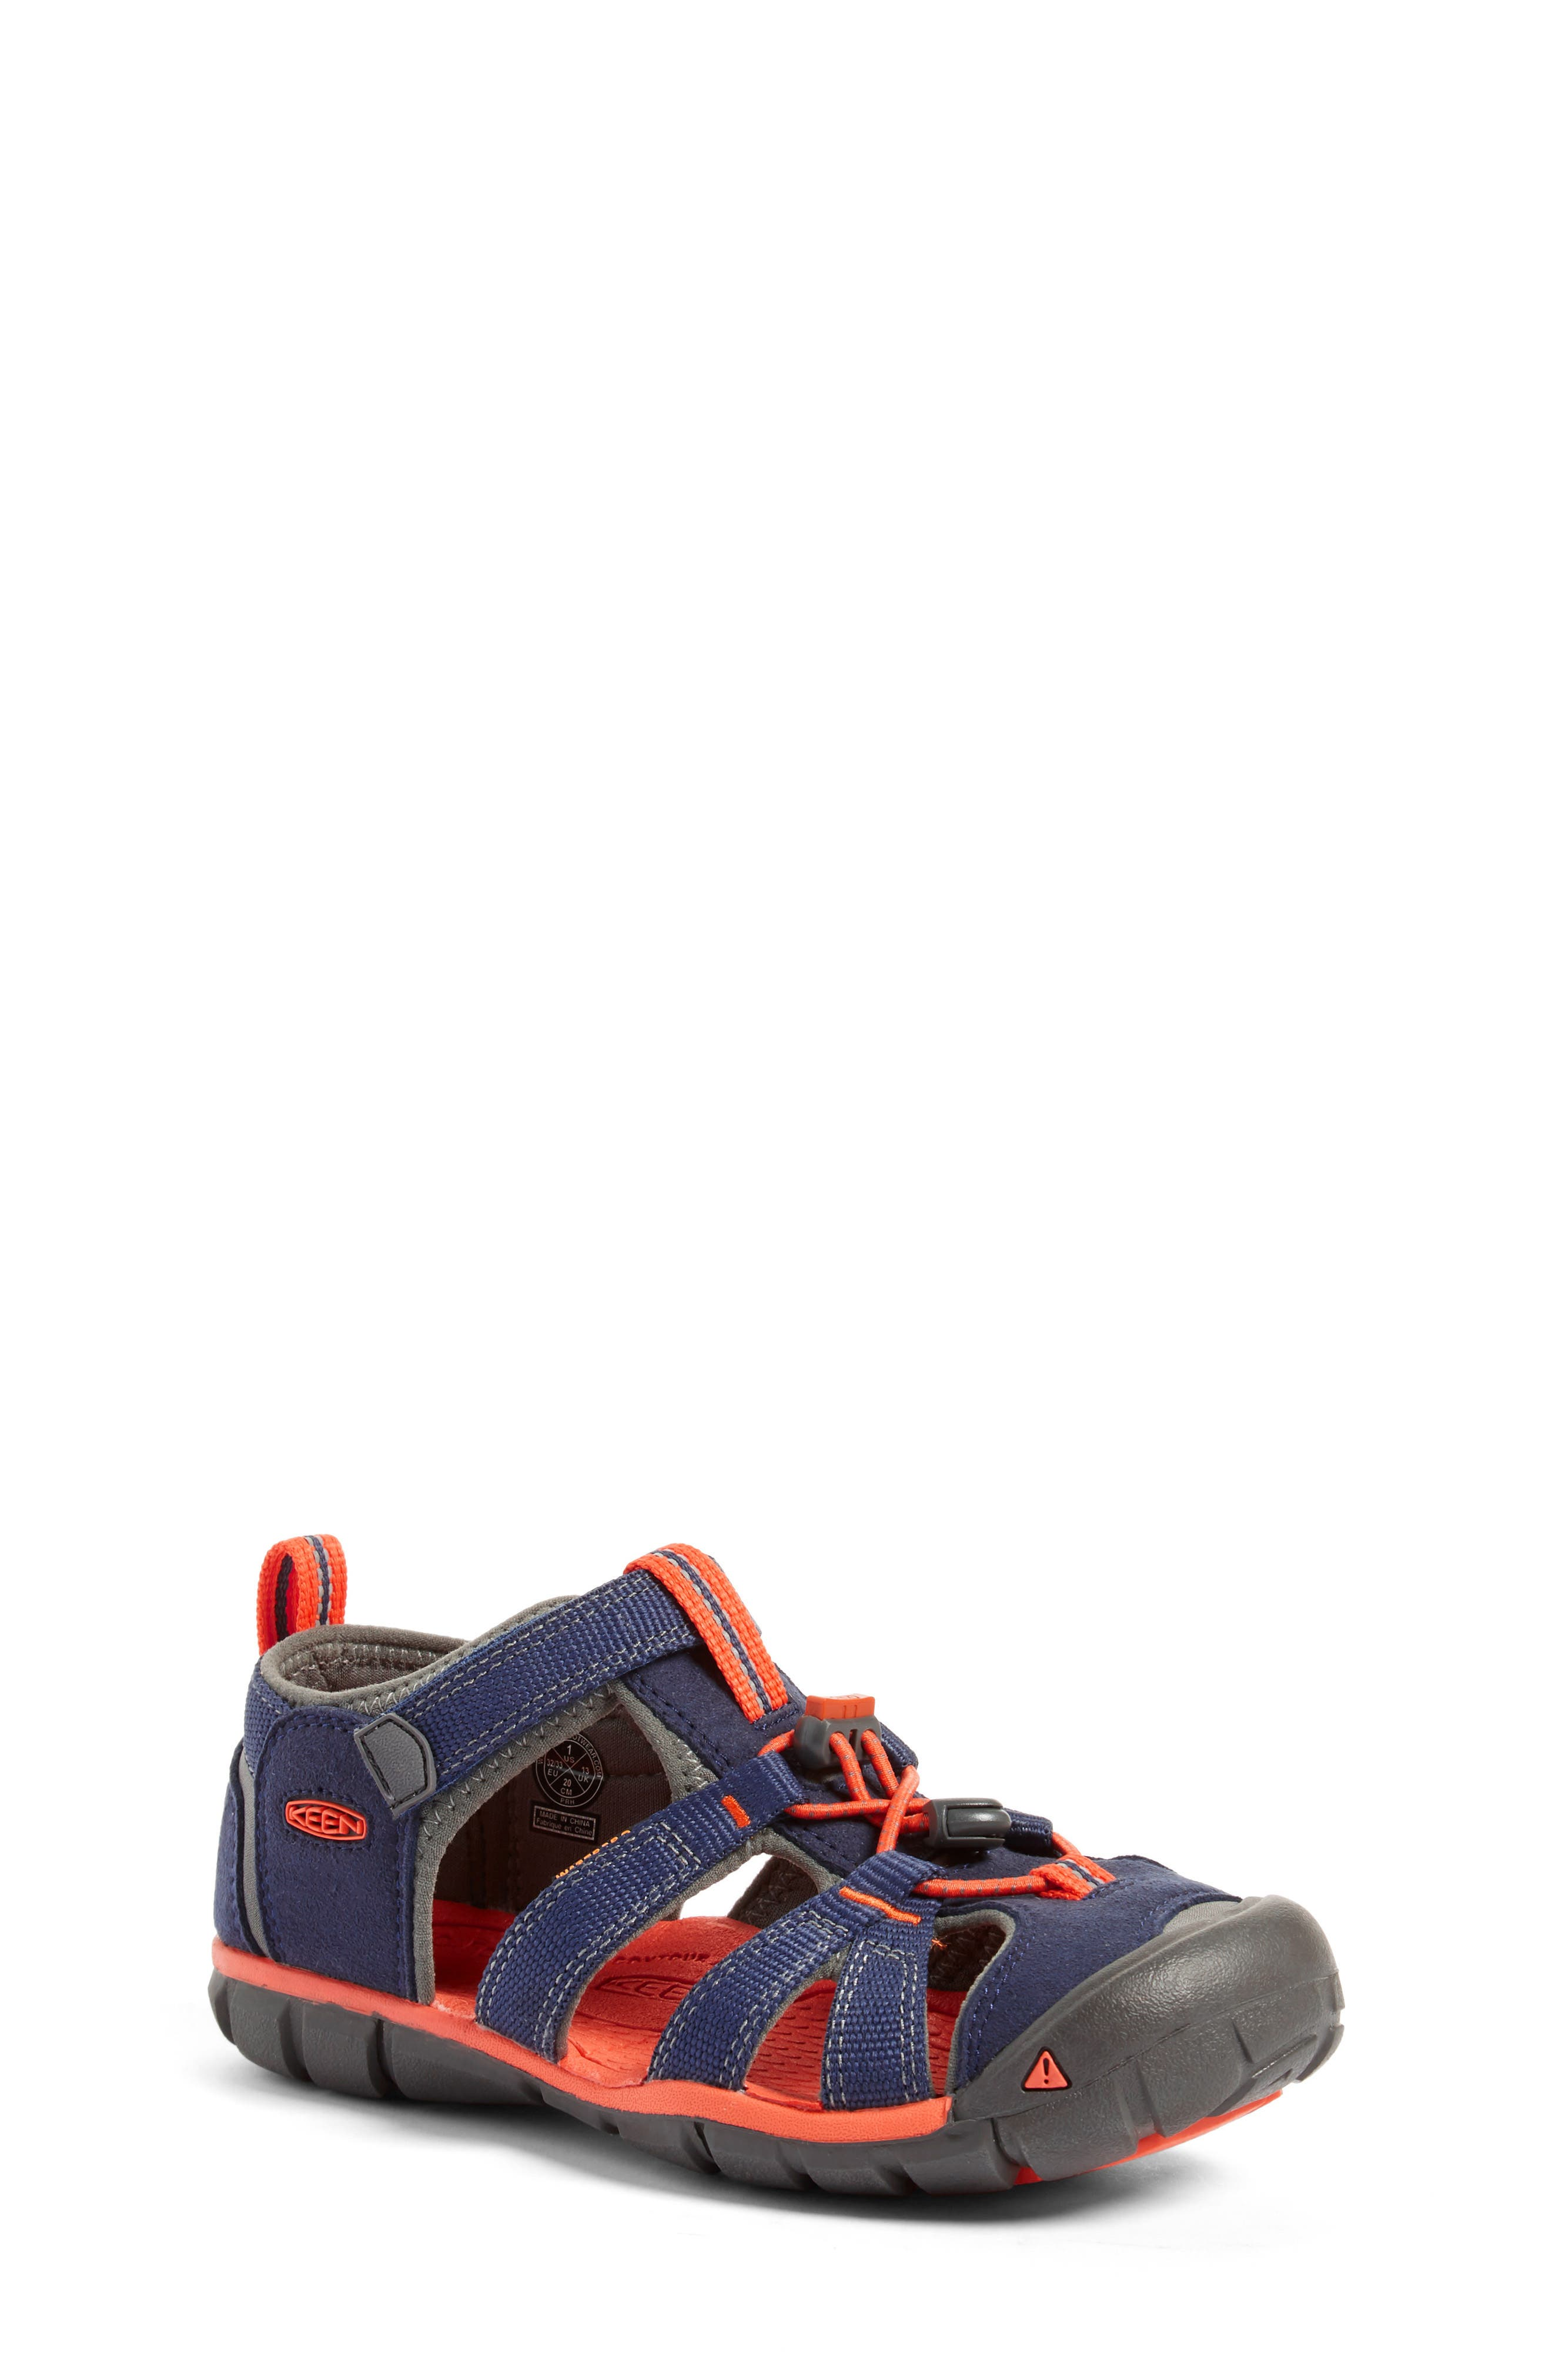 ,                             'Seacamp II' Water Friendly Sandal,                             Alternate thumbnail 157, color,                             402